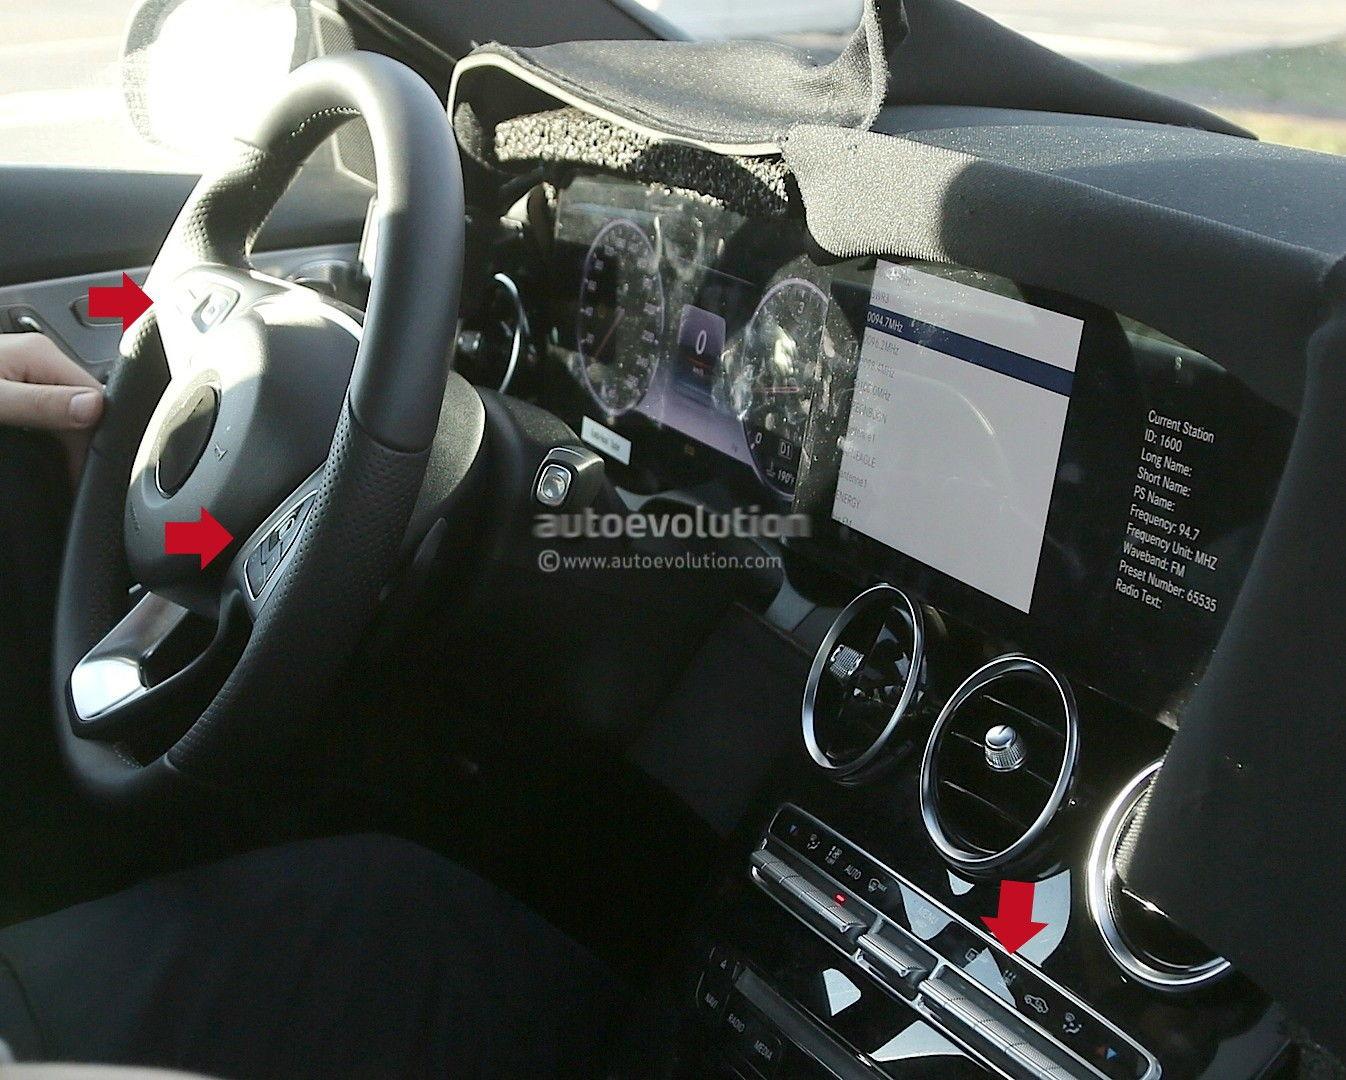 2018 Mercedes C Class Facelift Interior Spyshots Mbworld